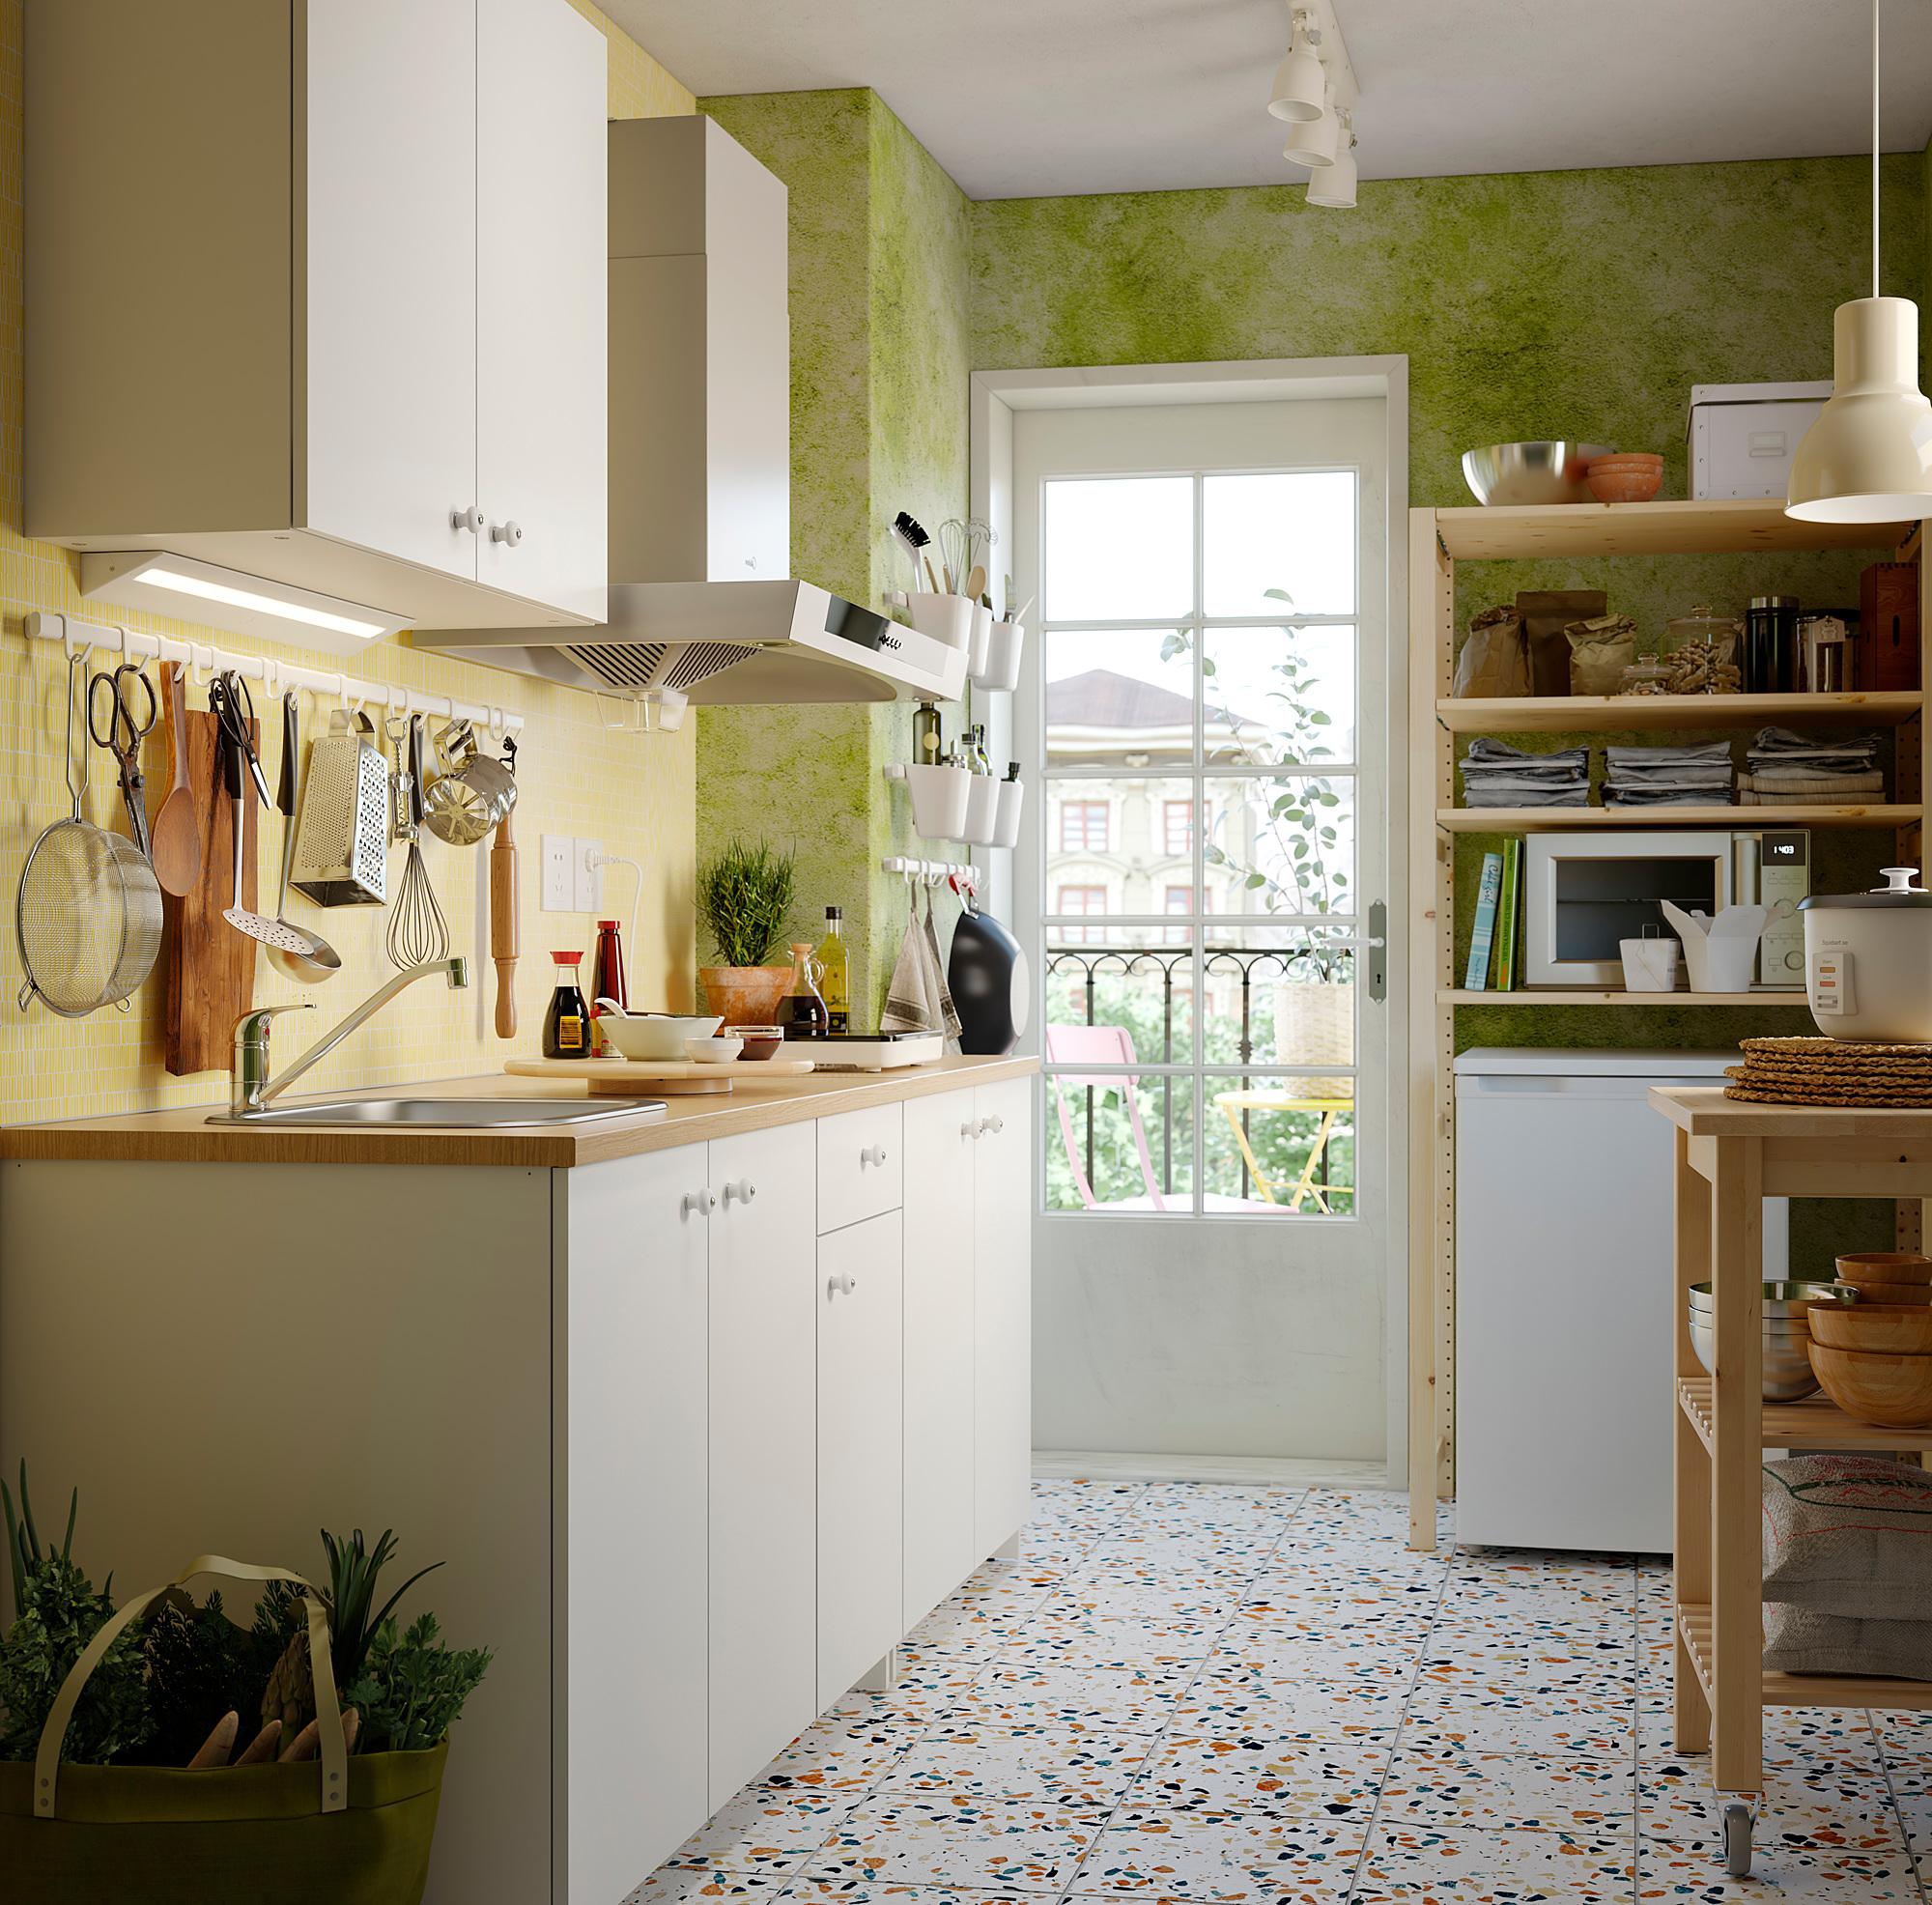 Knoxhult Dapur Putih Ikea Indonesia